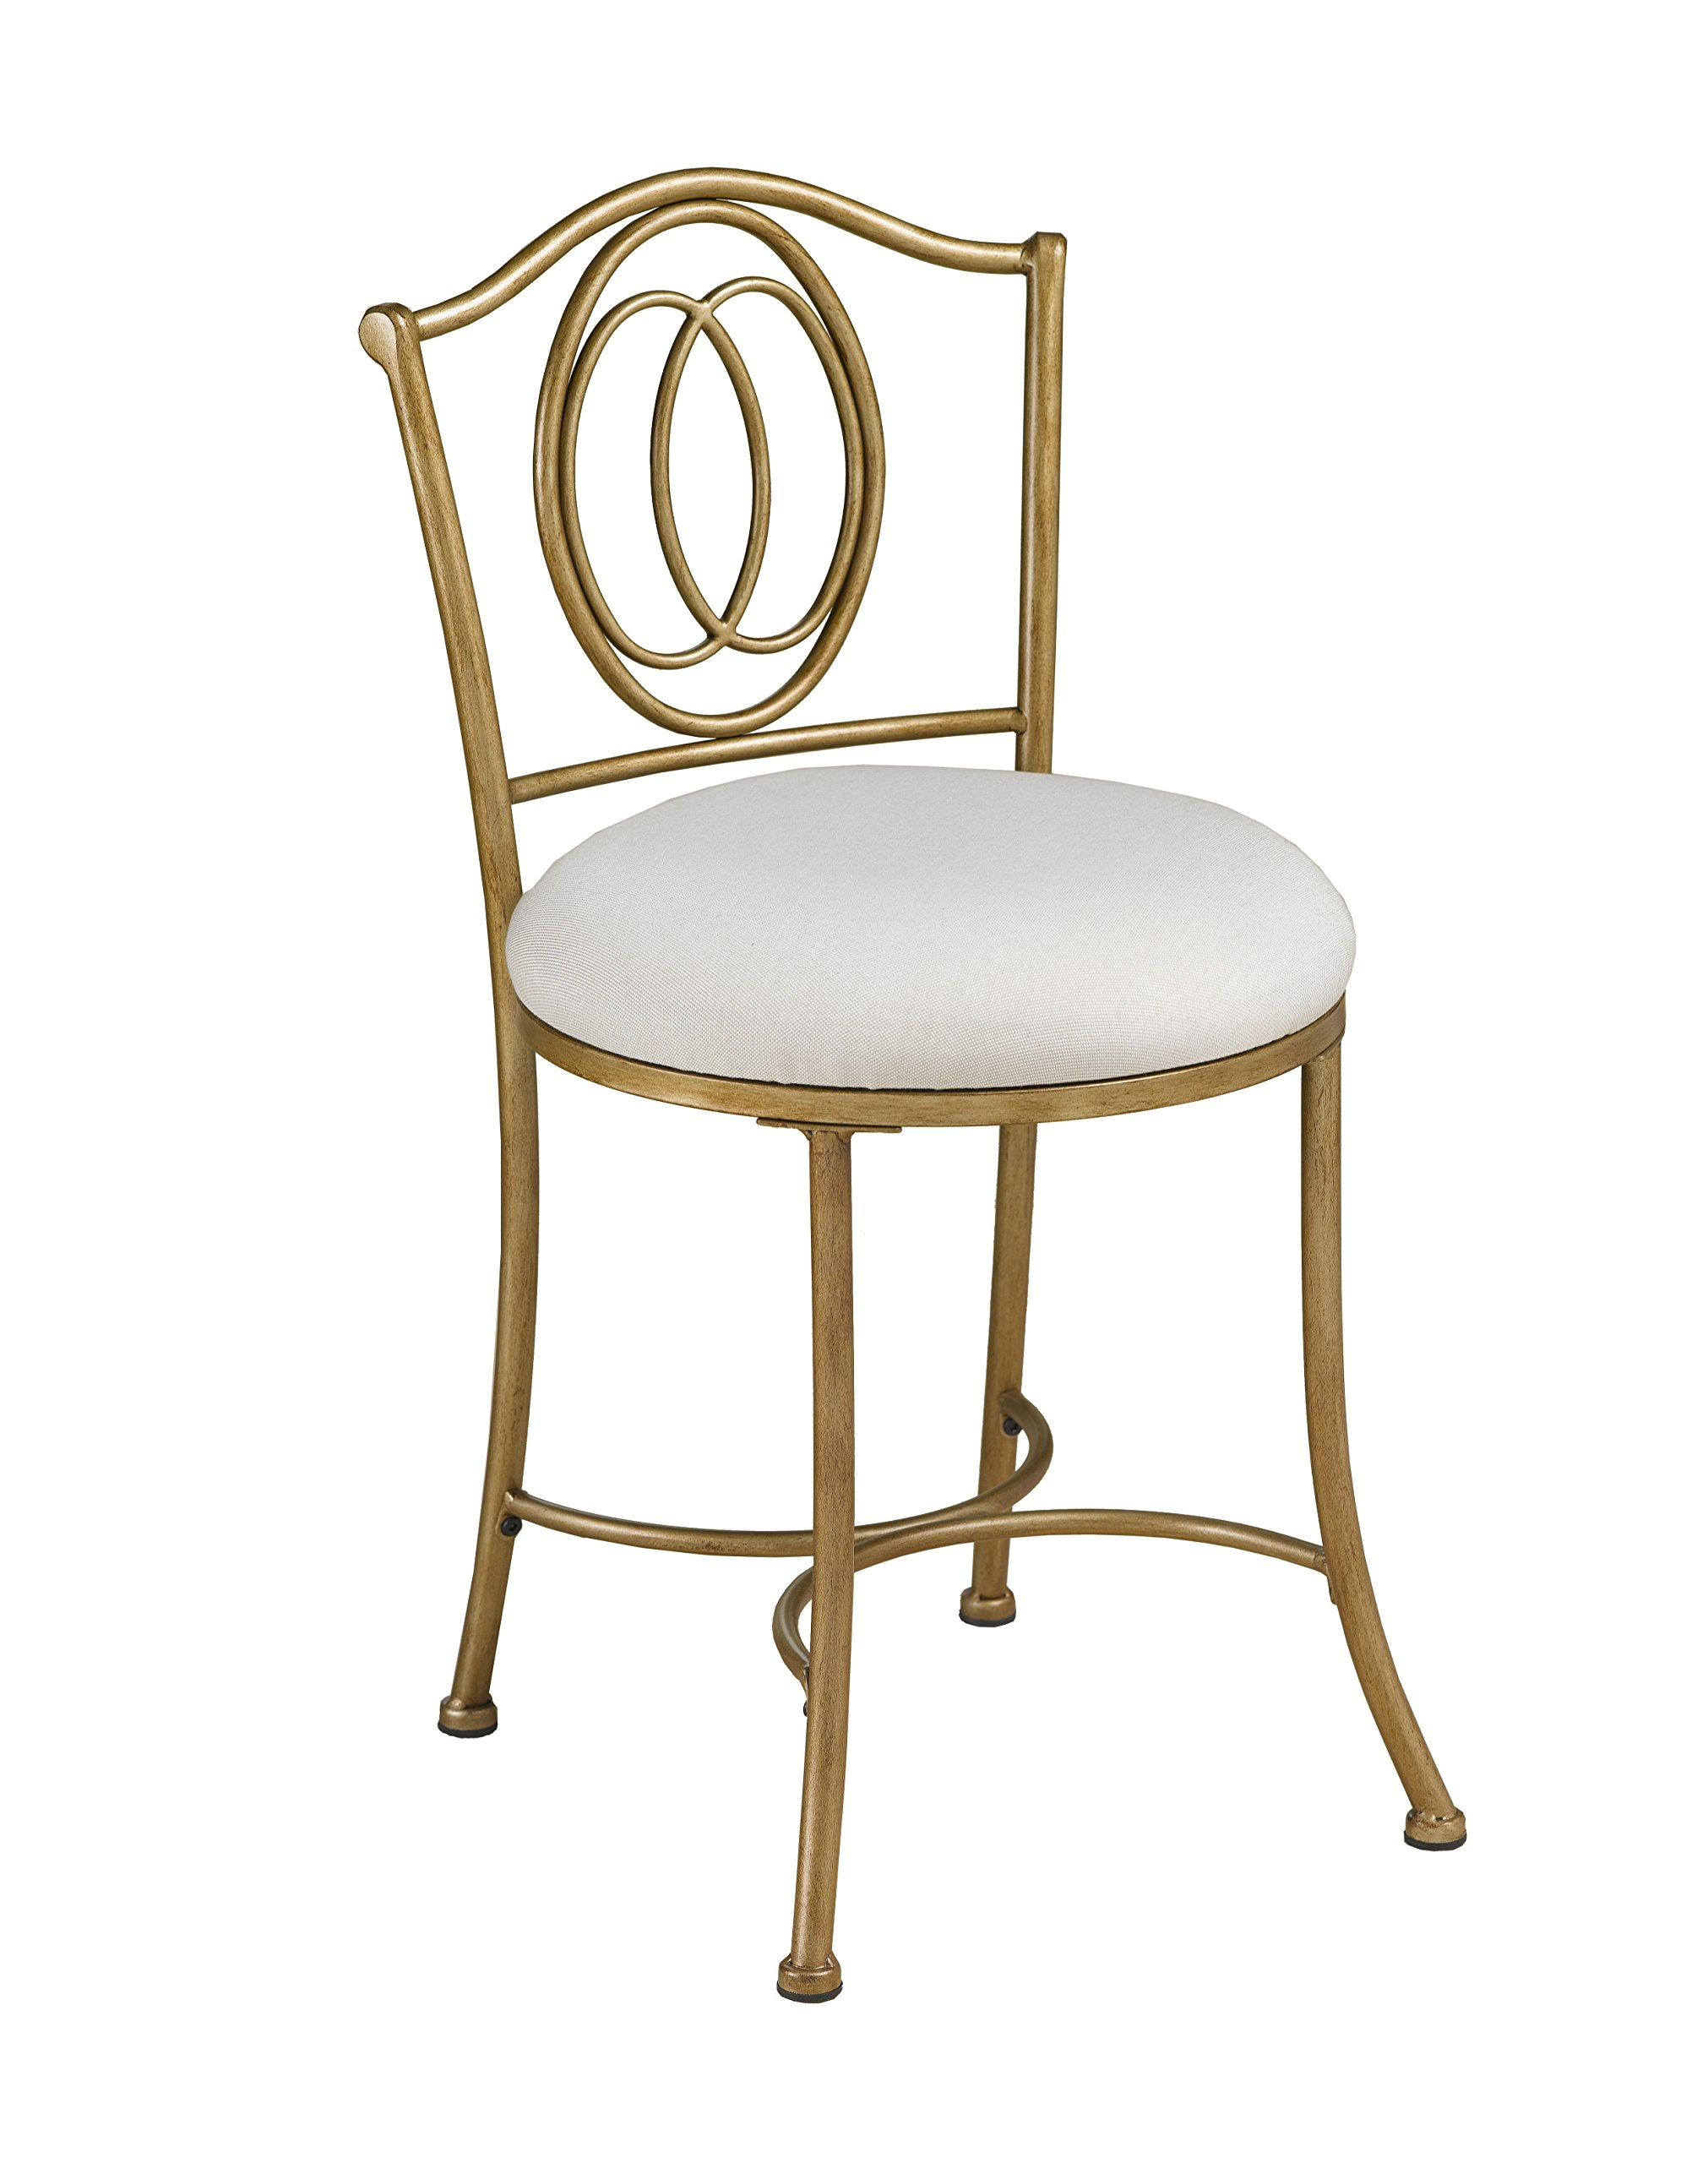 Hillsdale Emerson Vanity Stool, Golden Bronze by Hillsdale Furniture